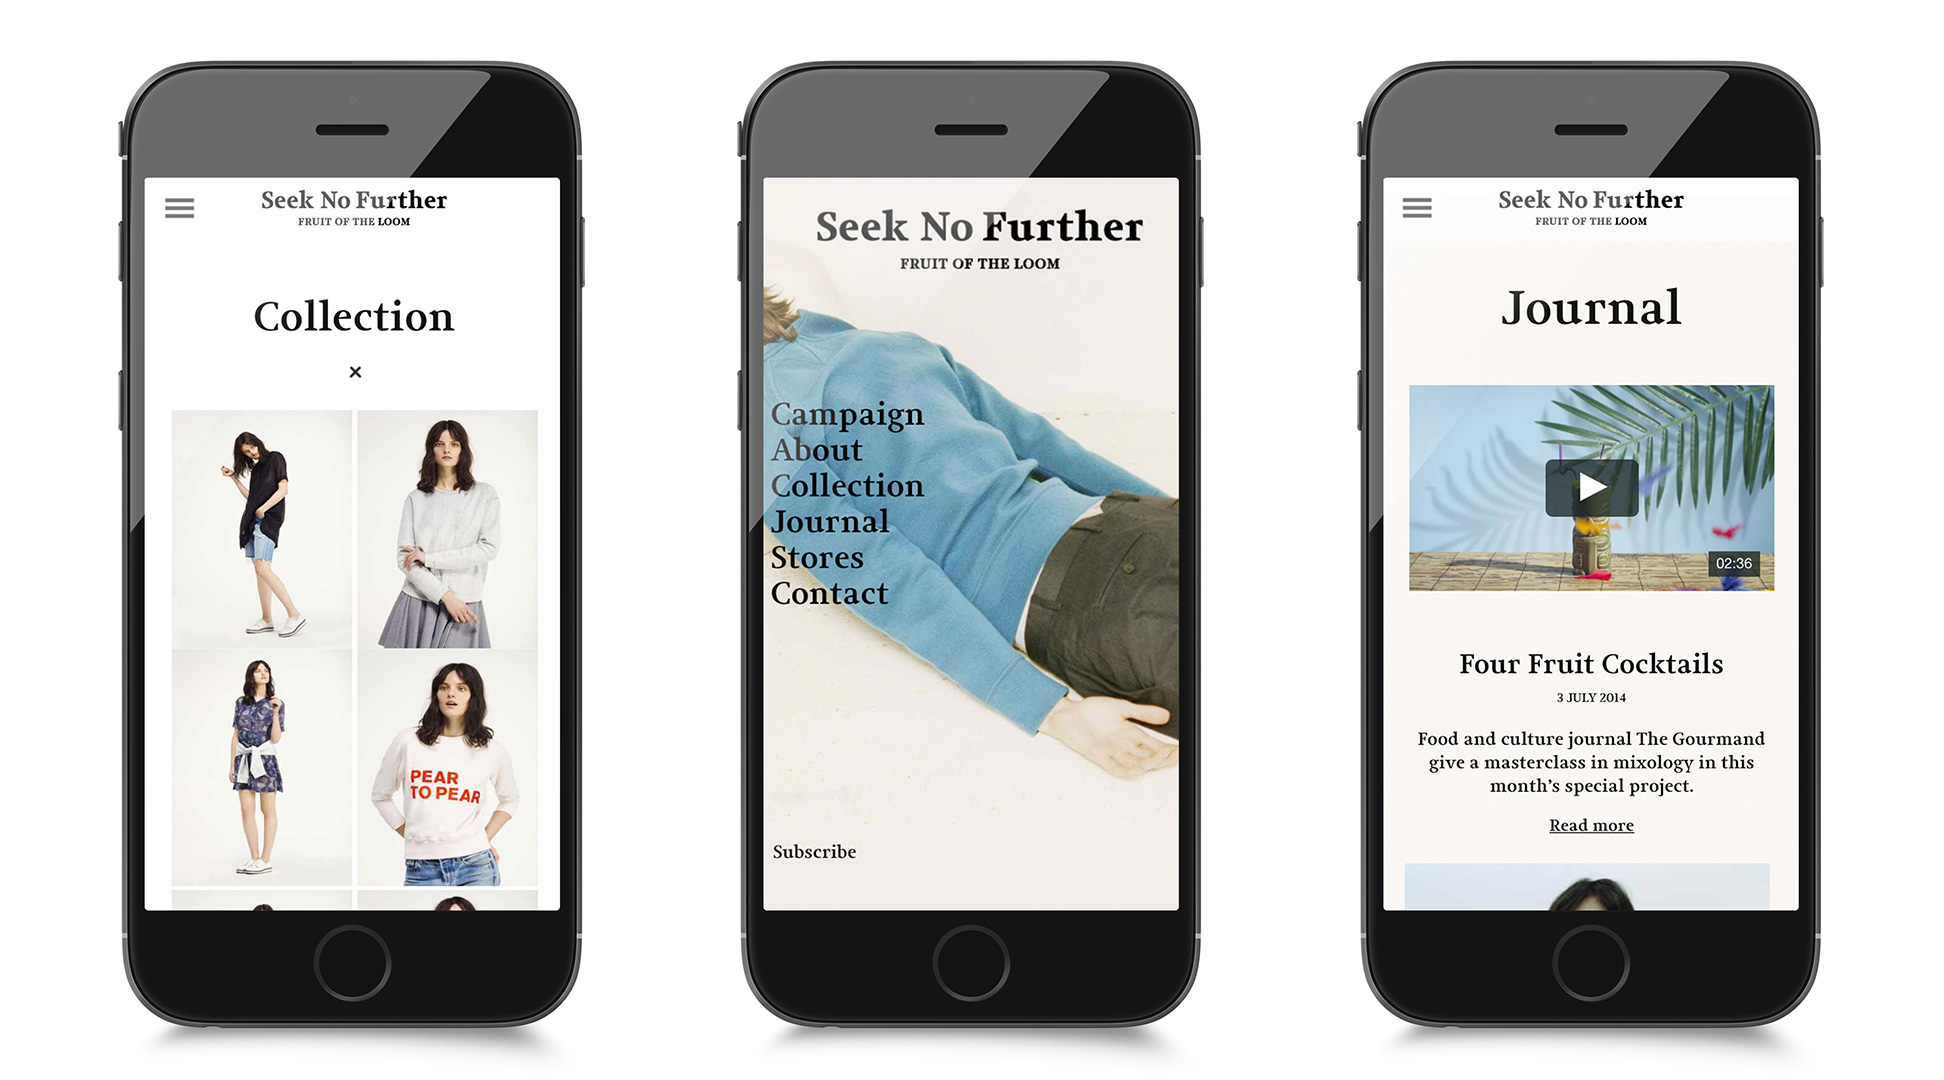 seekNoFurther-Tamassy-iPhone6